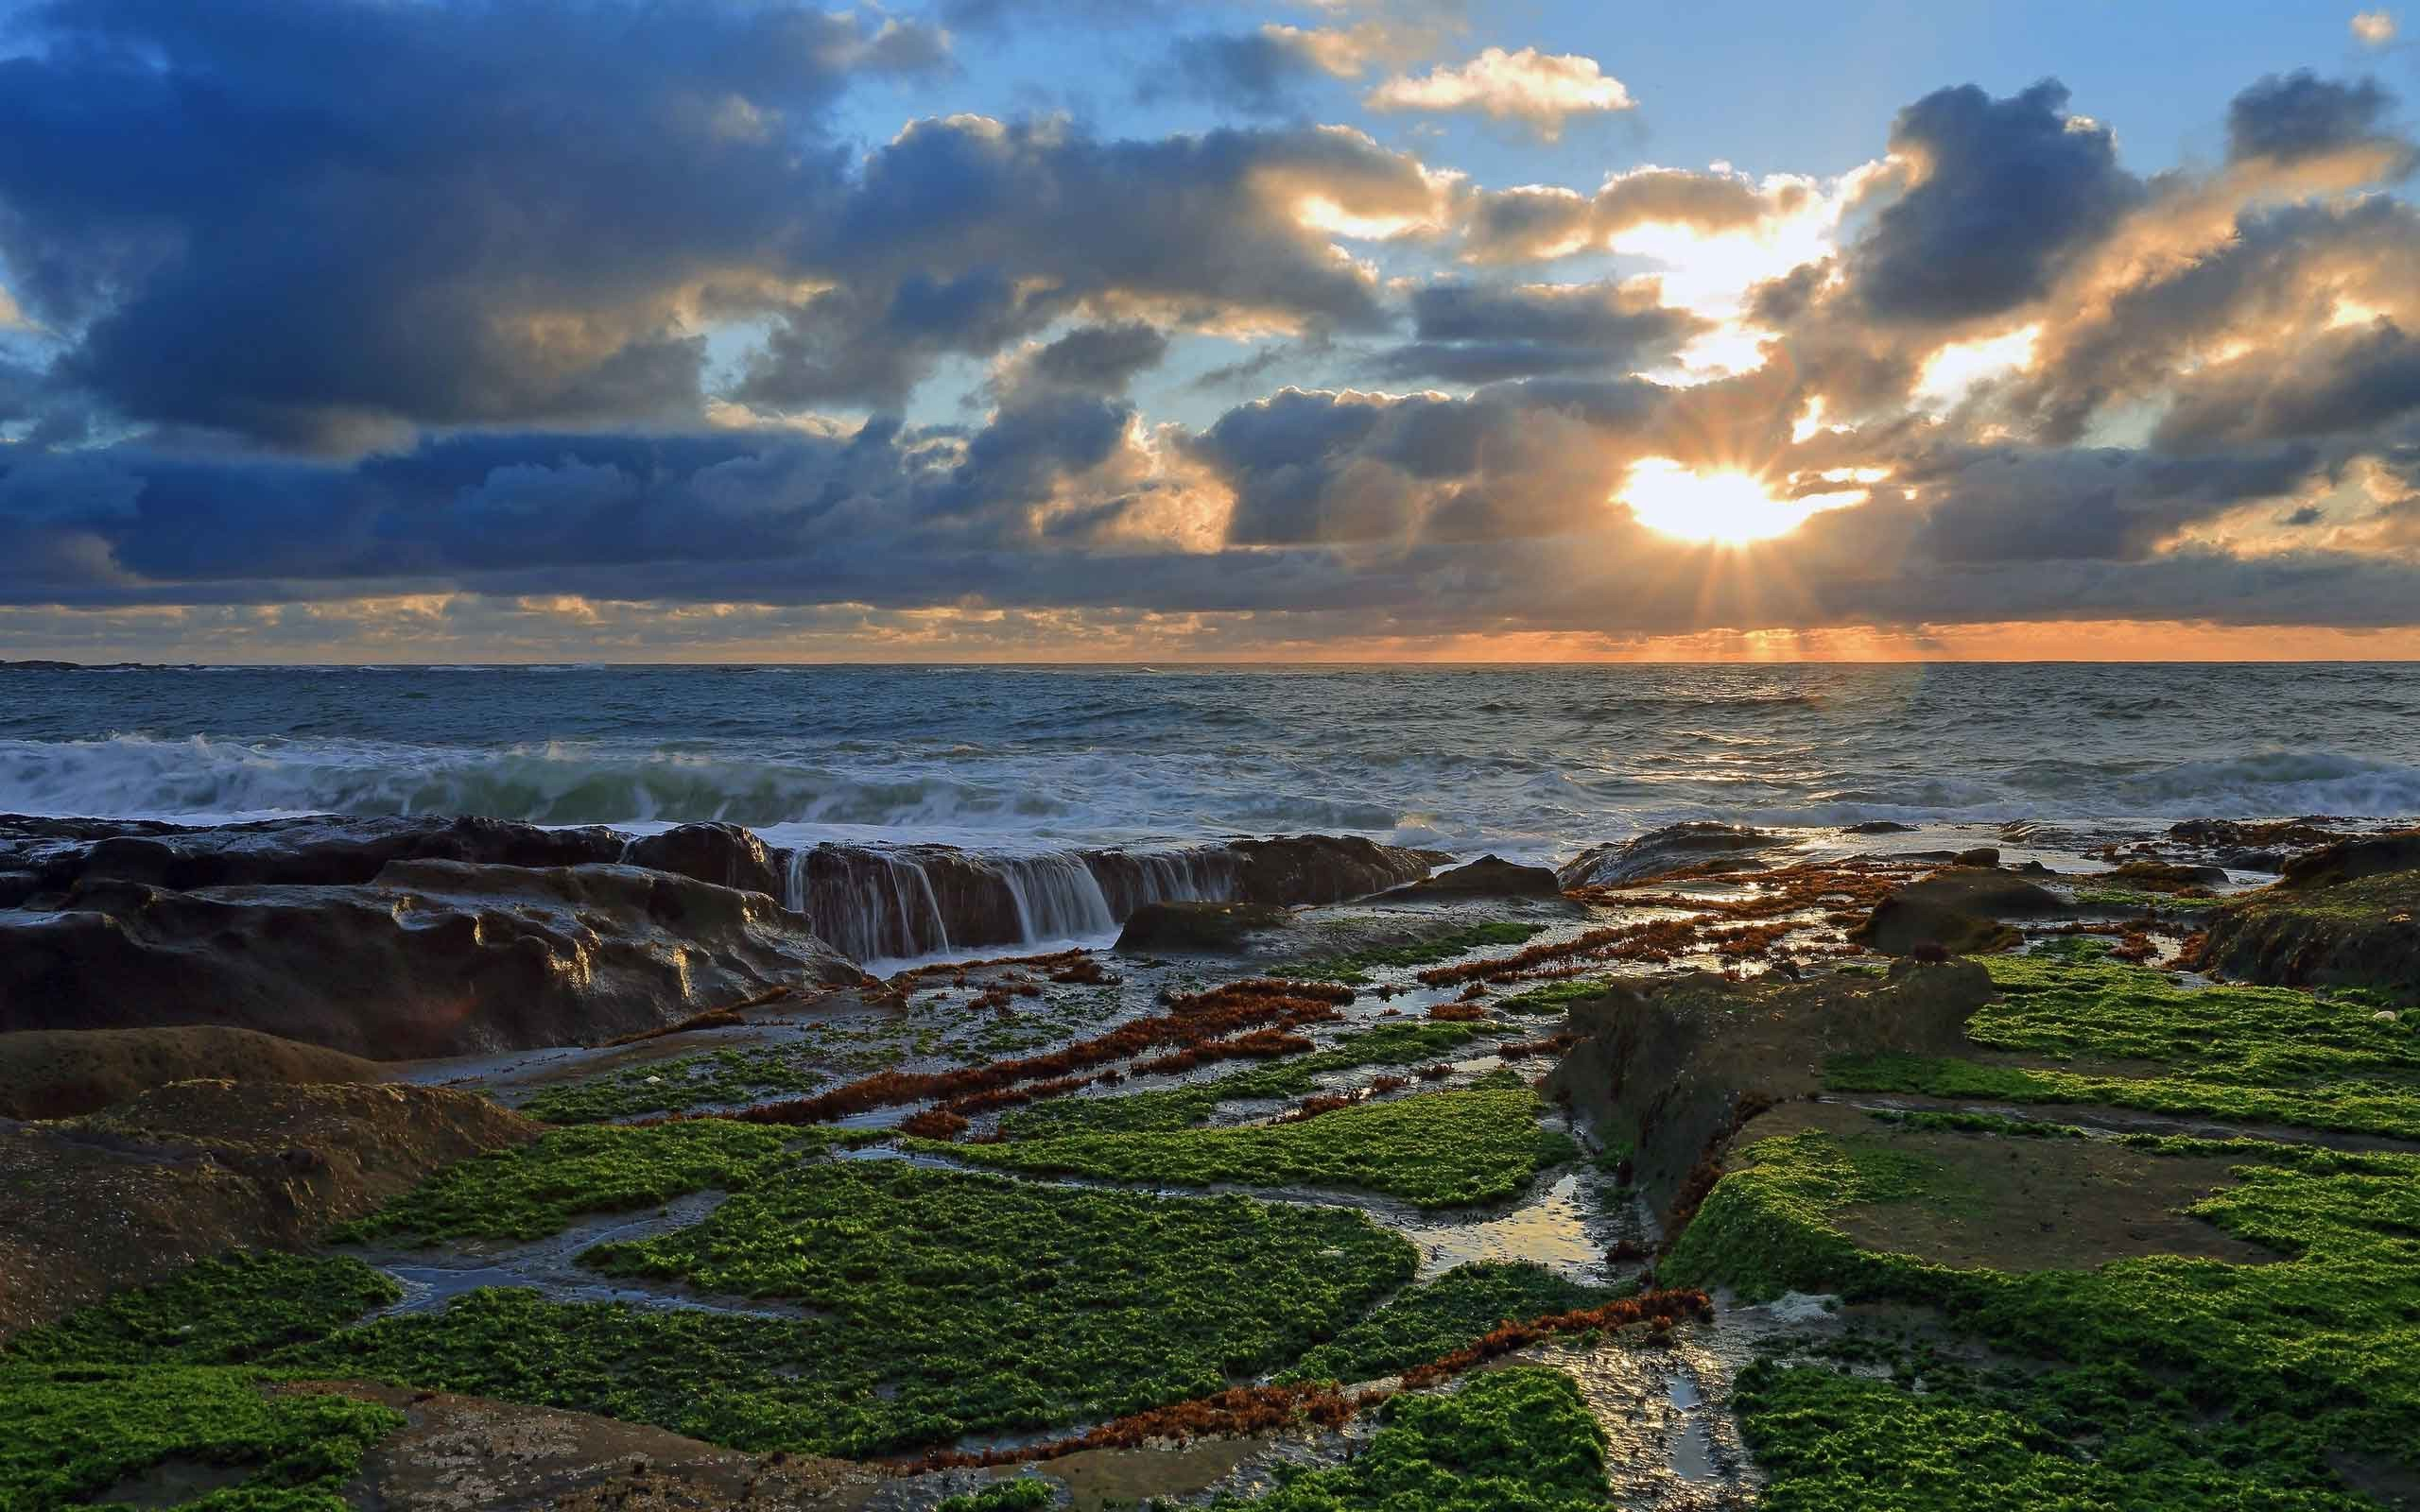 Sunrise Sunset Coast Clouds Rocks Ocean Desktop Wallpaper Nature Scenes